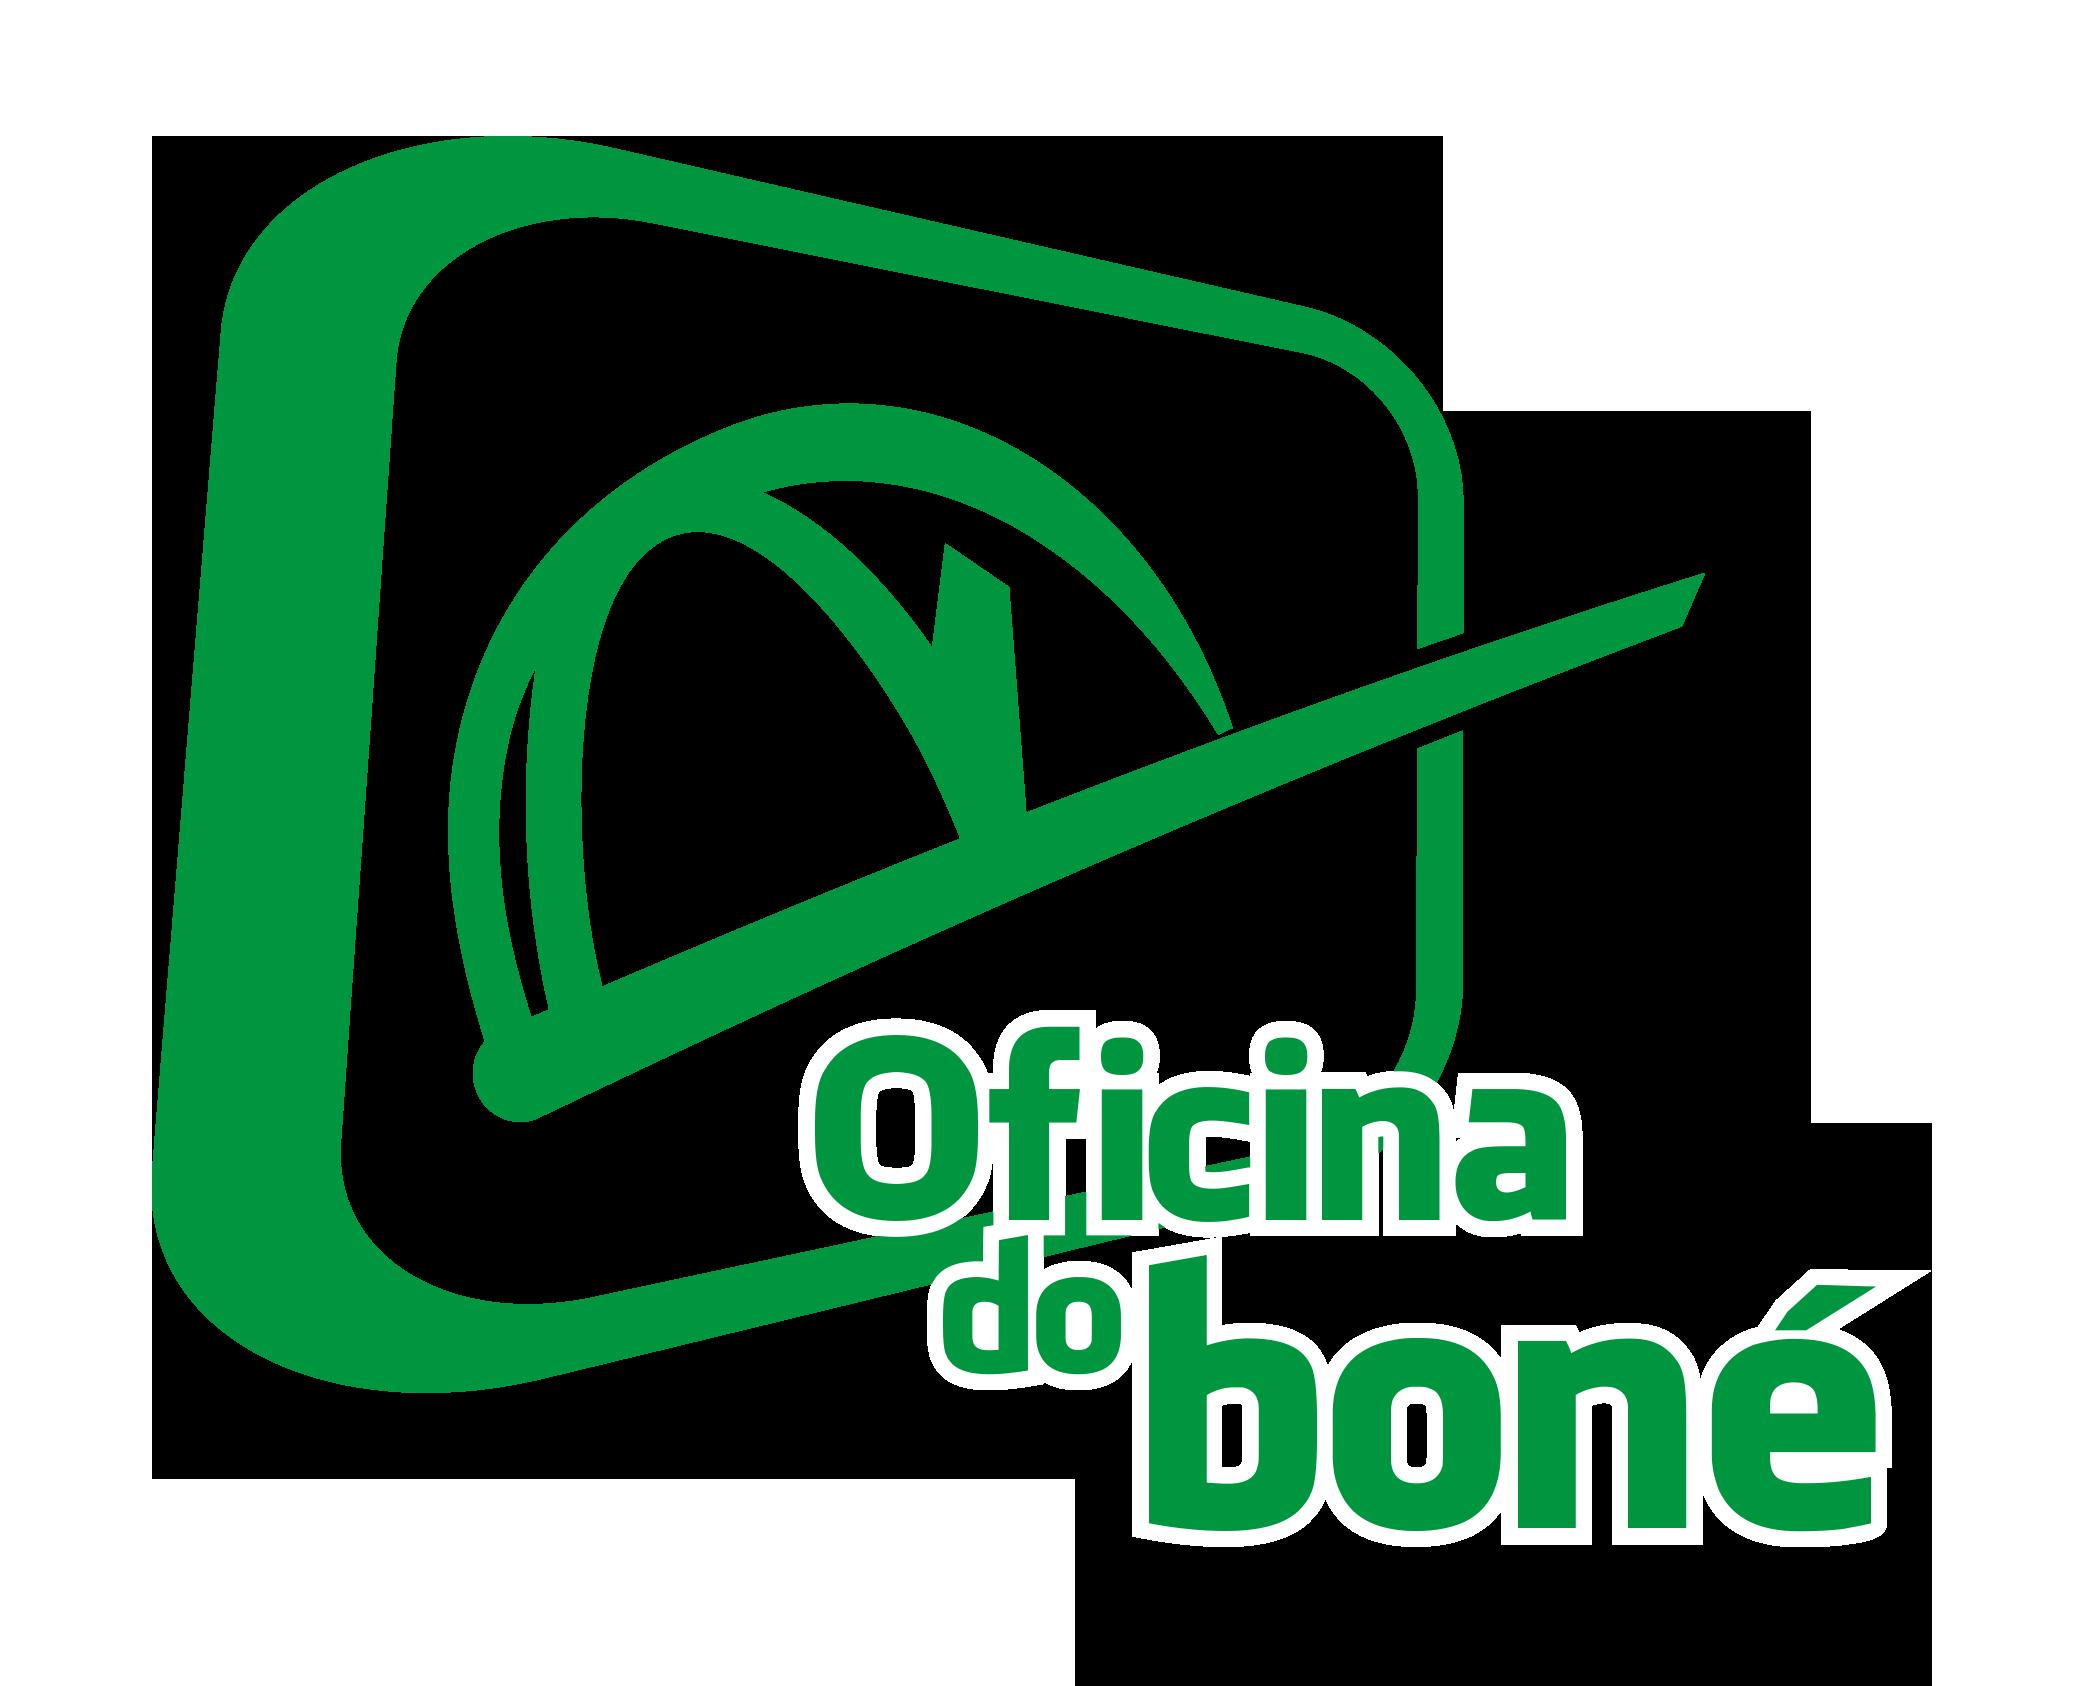 Oficina do Boné